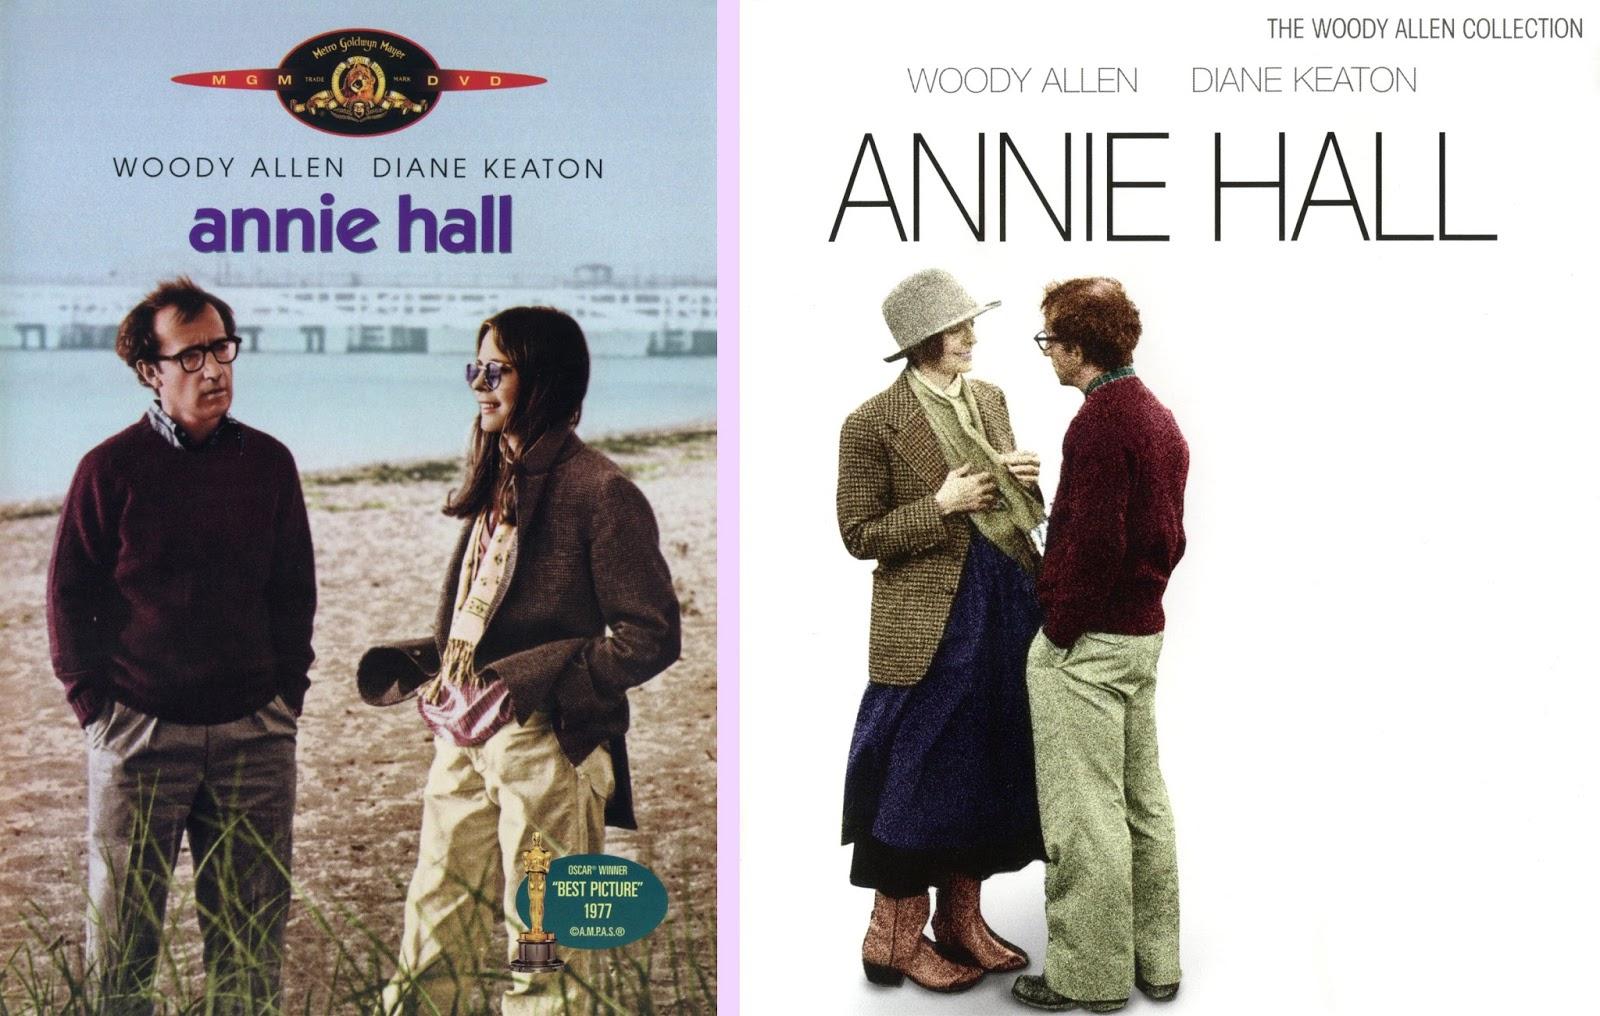 annie hall movie - photo #3